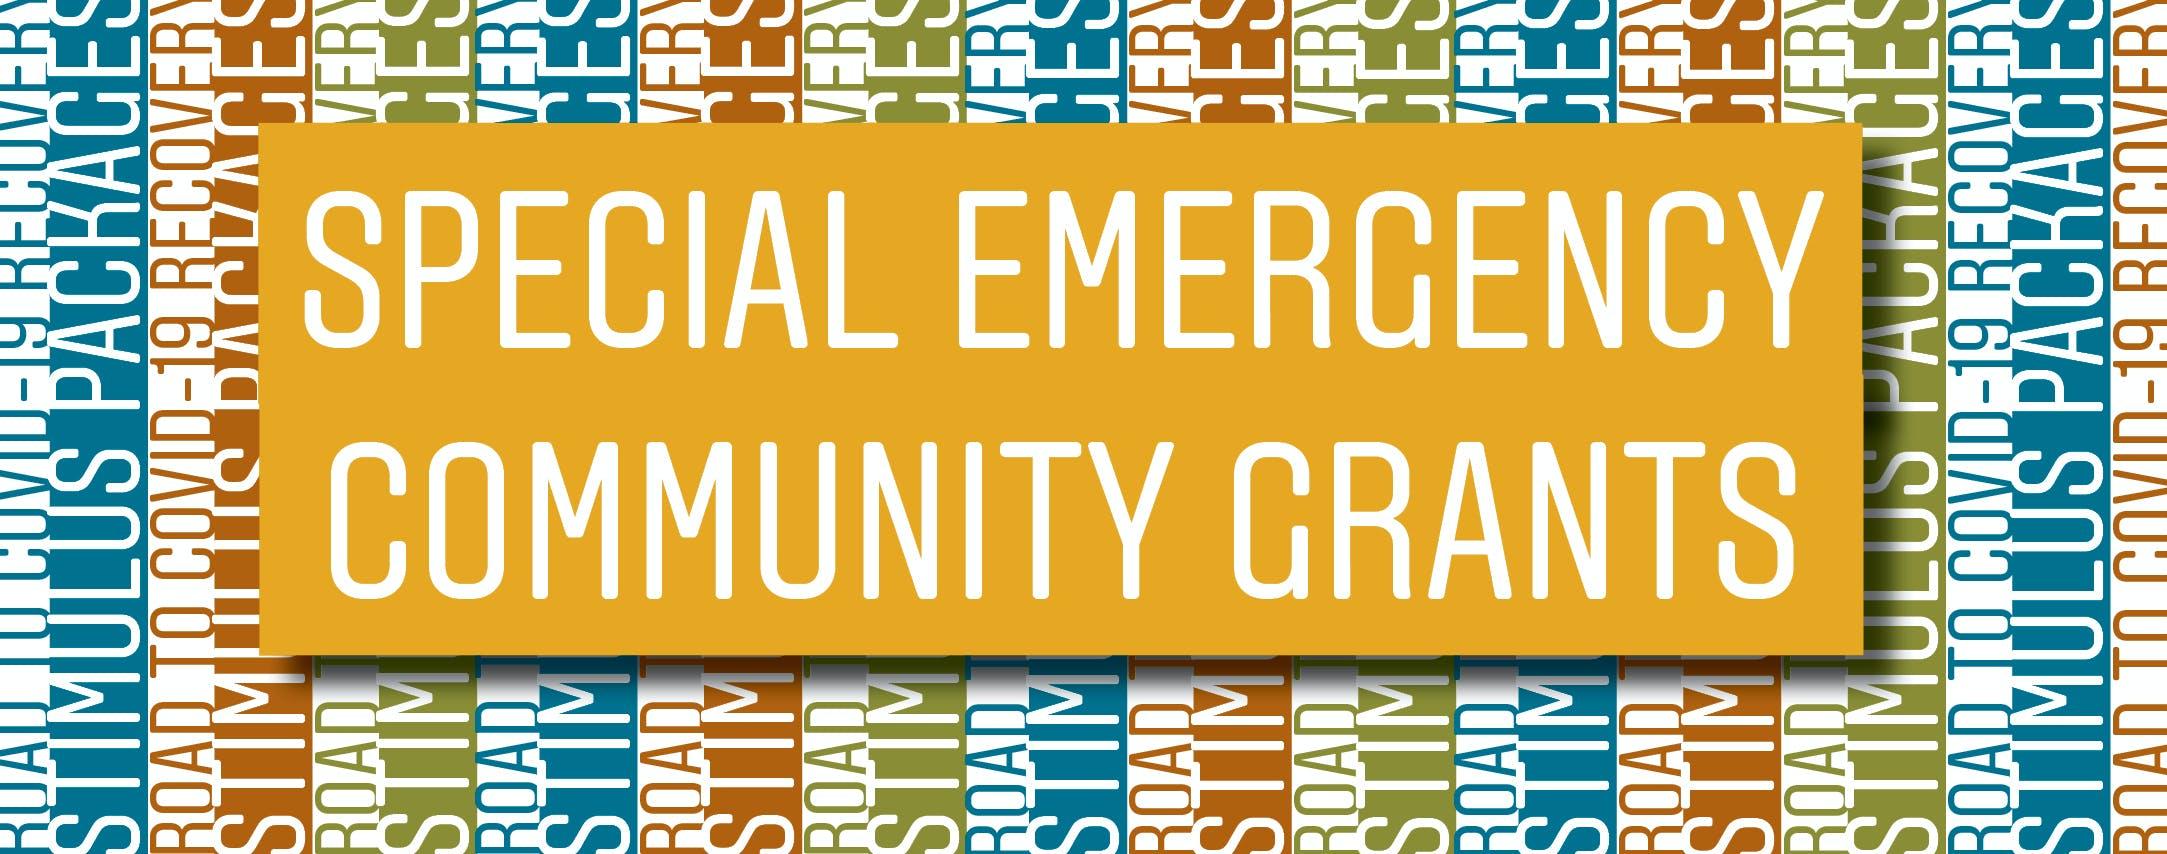 Special emergency community grants